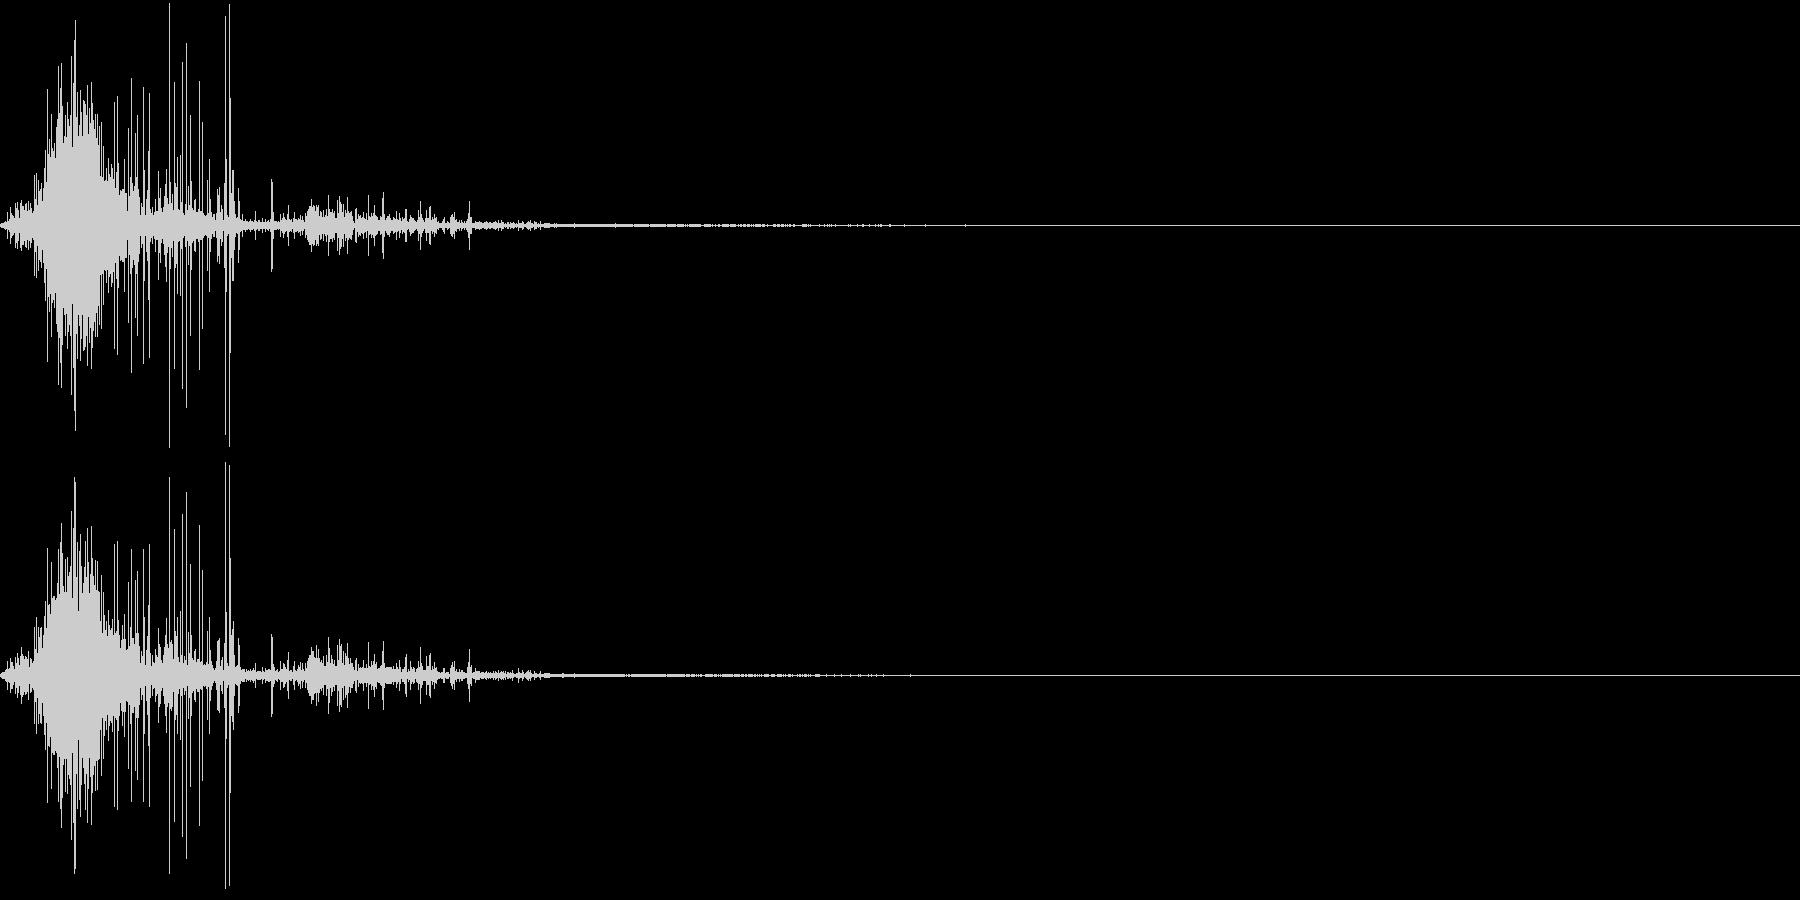 Zombie ゾンビの噛み付き音 2の未再生の波形